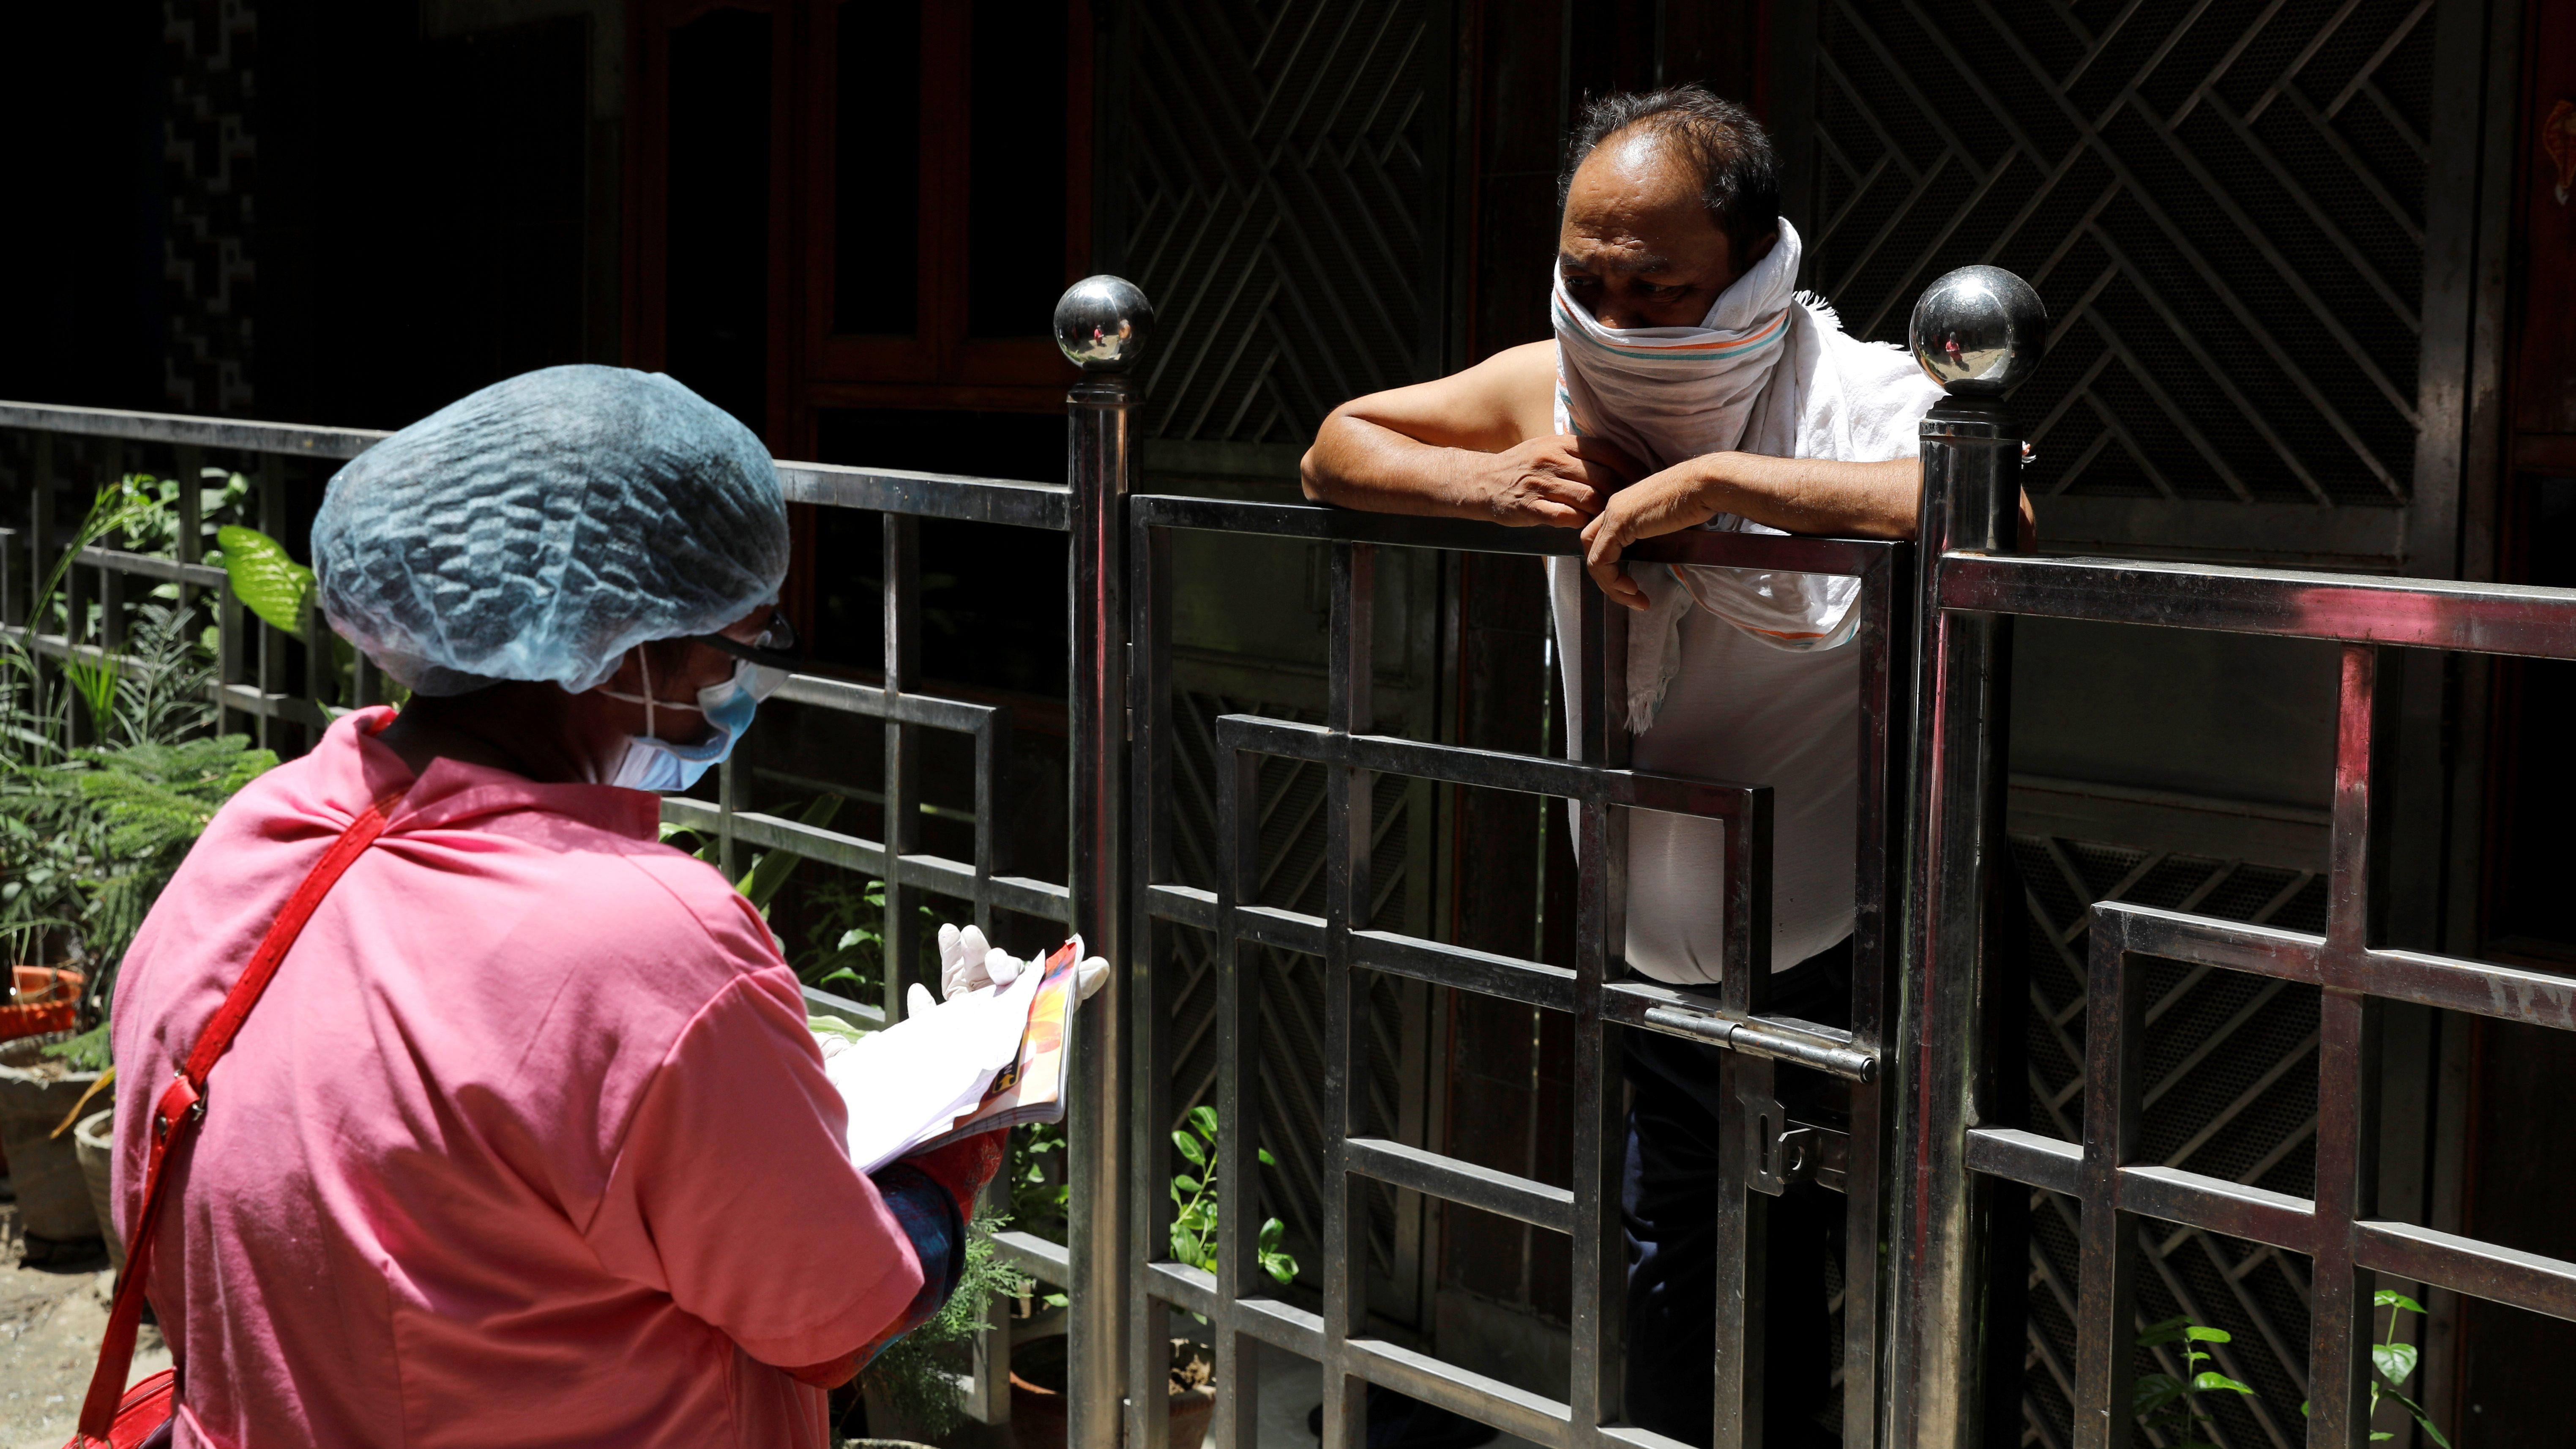 Outbreak of the coronavirus disease (COVID-19) in New Delhi